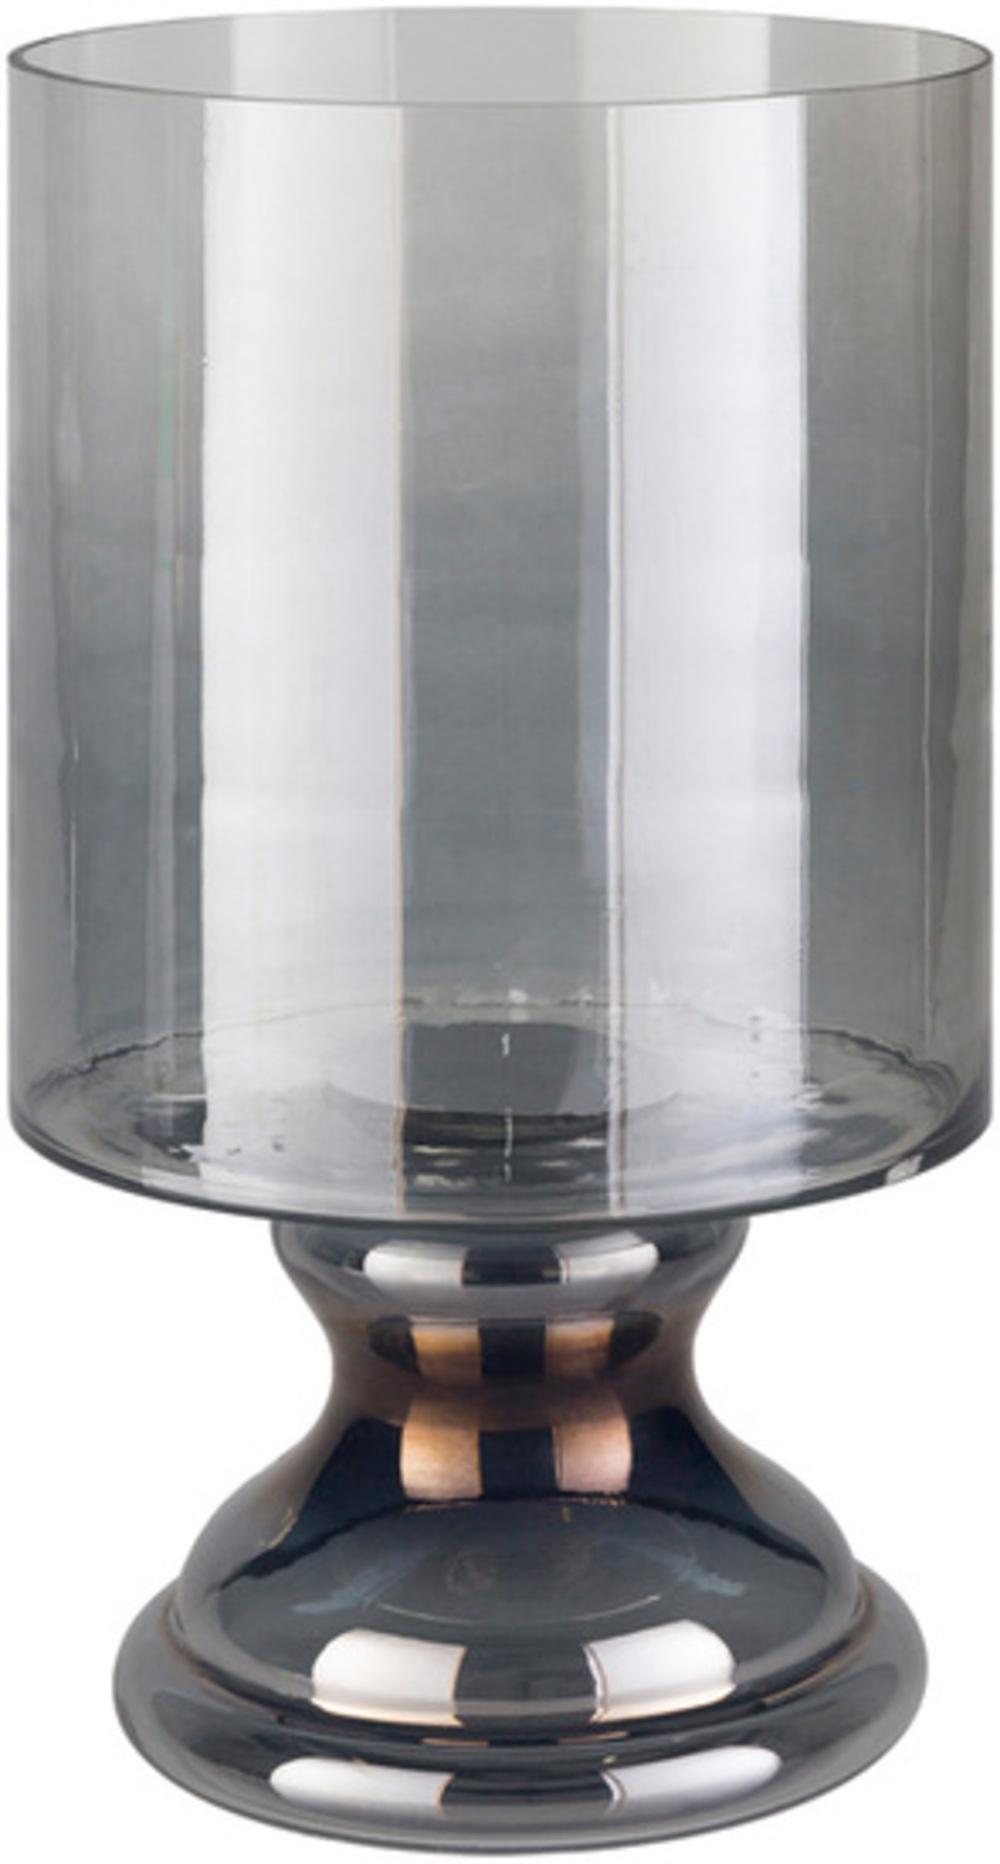 Surya - Vanburen Candle Holder